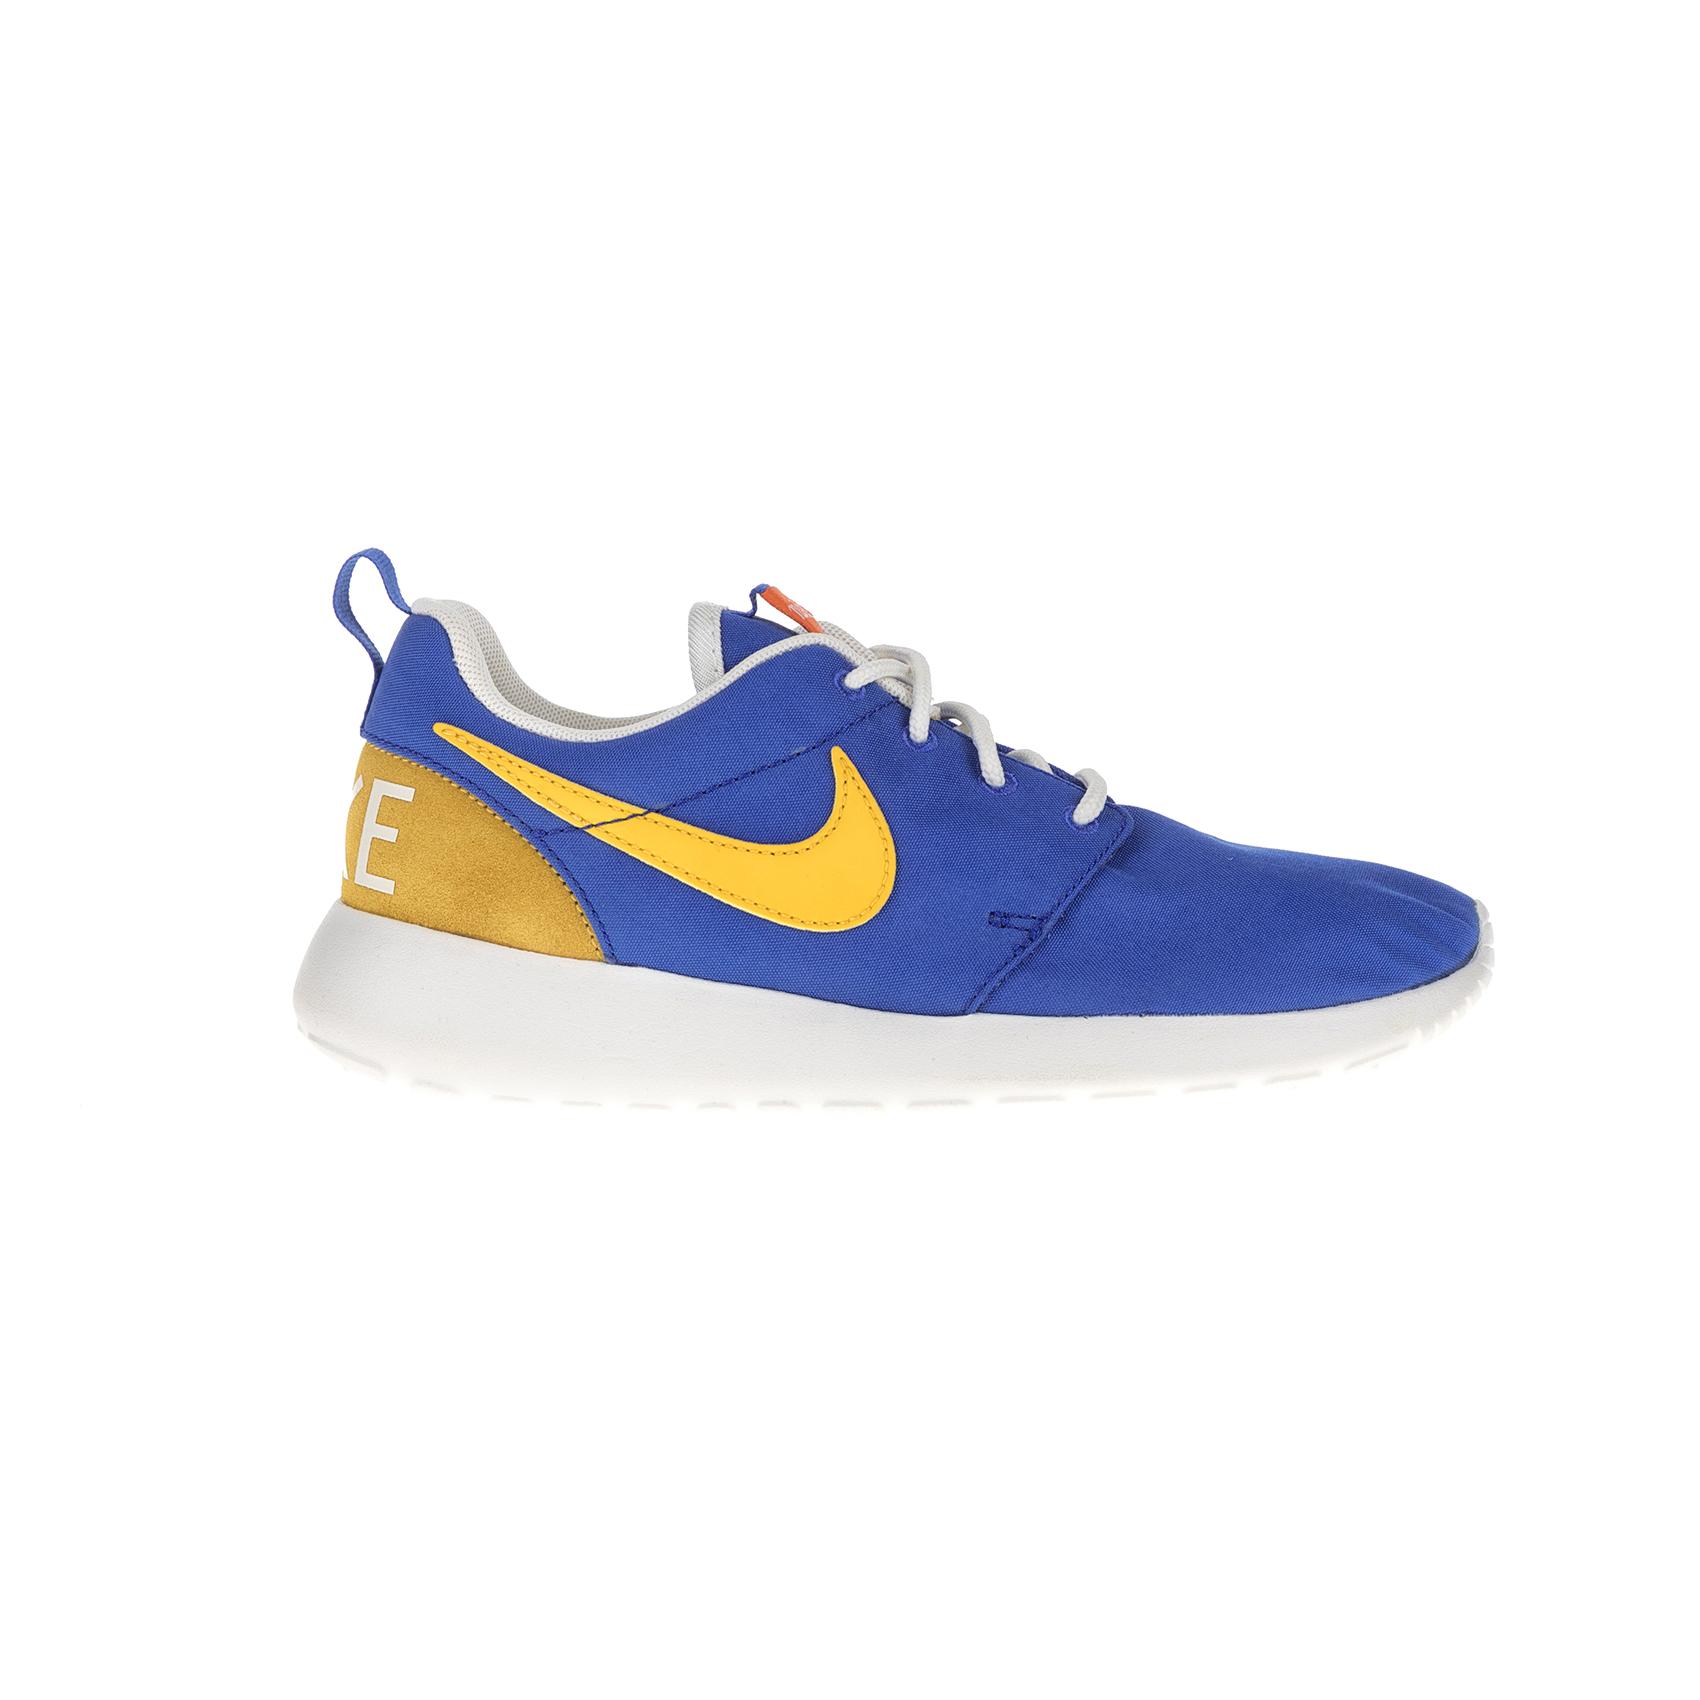 NIKE – Γυναικεία αθλητικά παπούτσια Nike ROSHE ONE RETRO μπλε